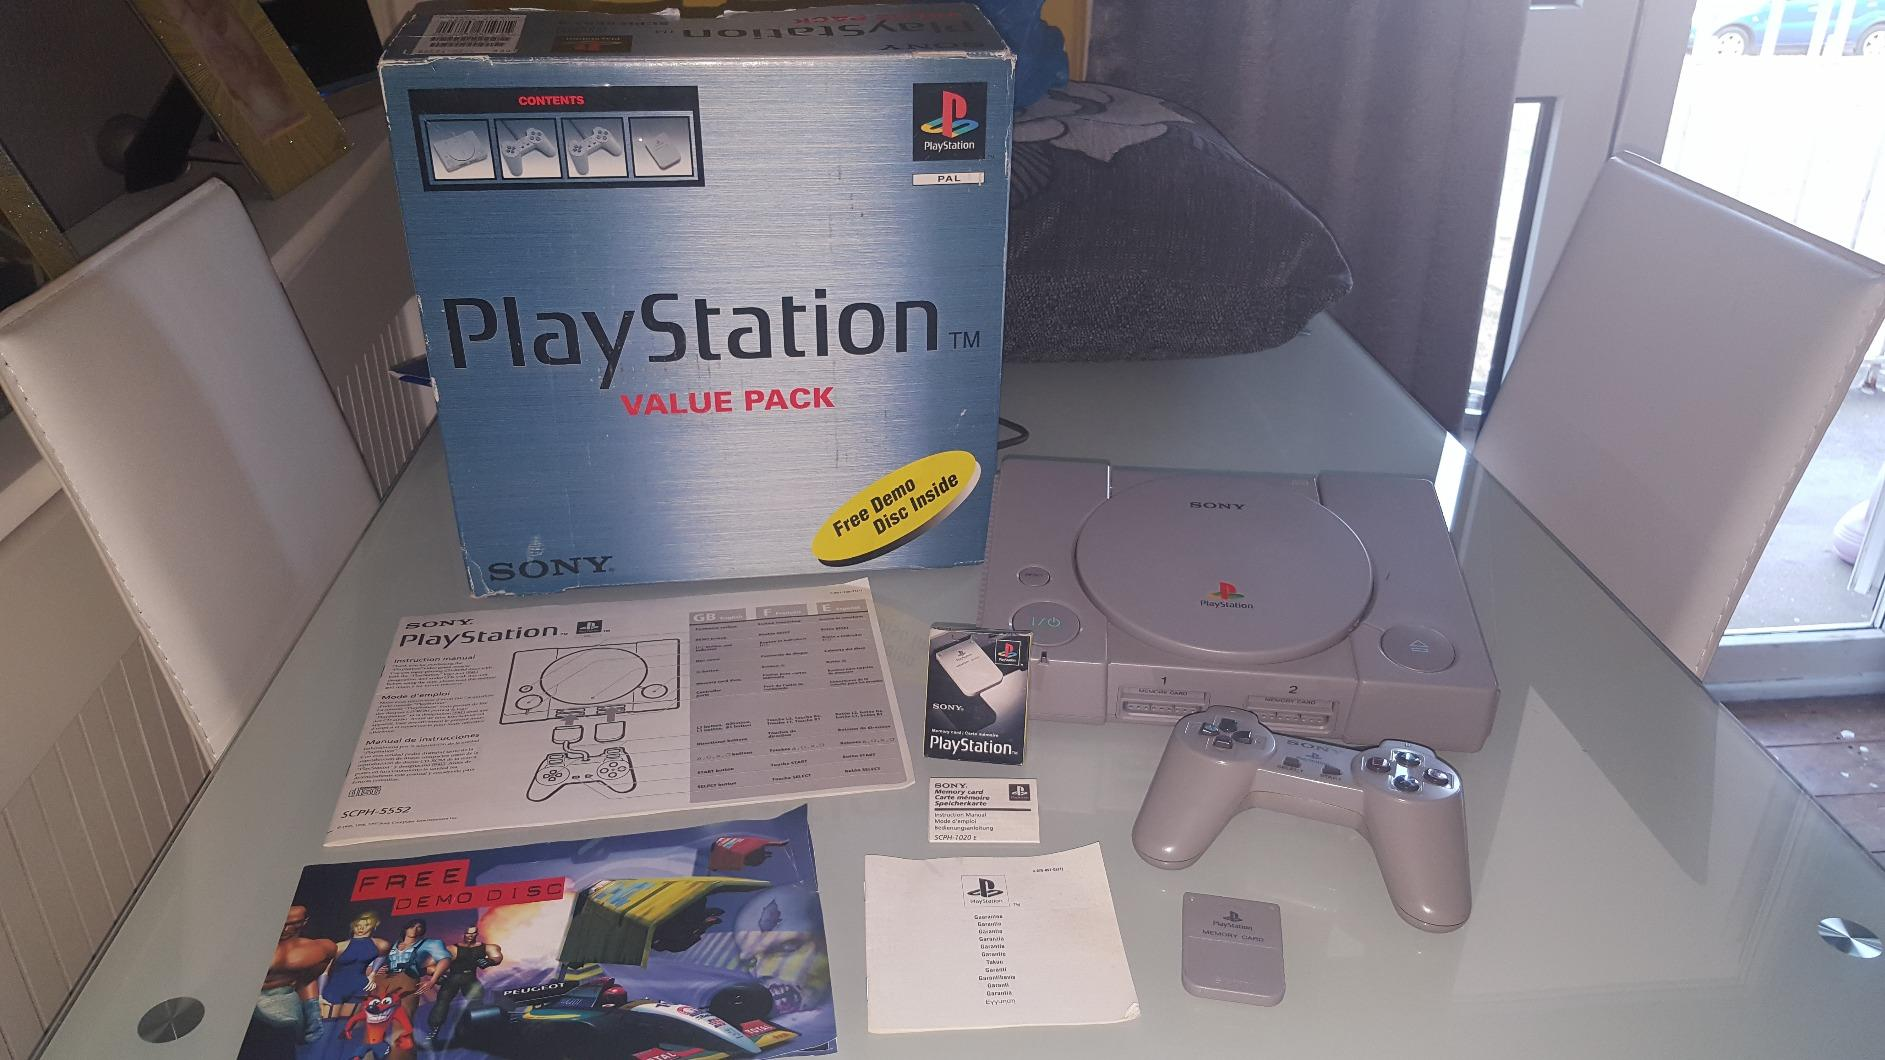 Sony PlayStation Console - Amazon Anh | Fado vn